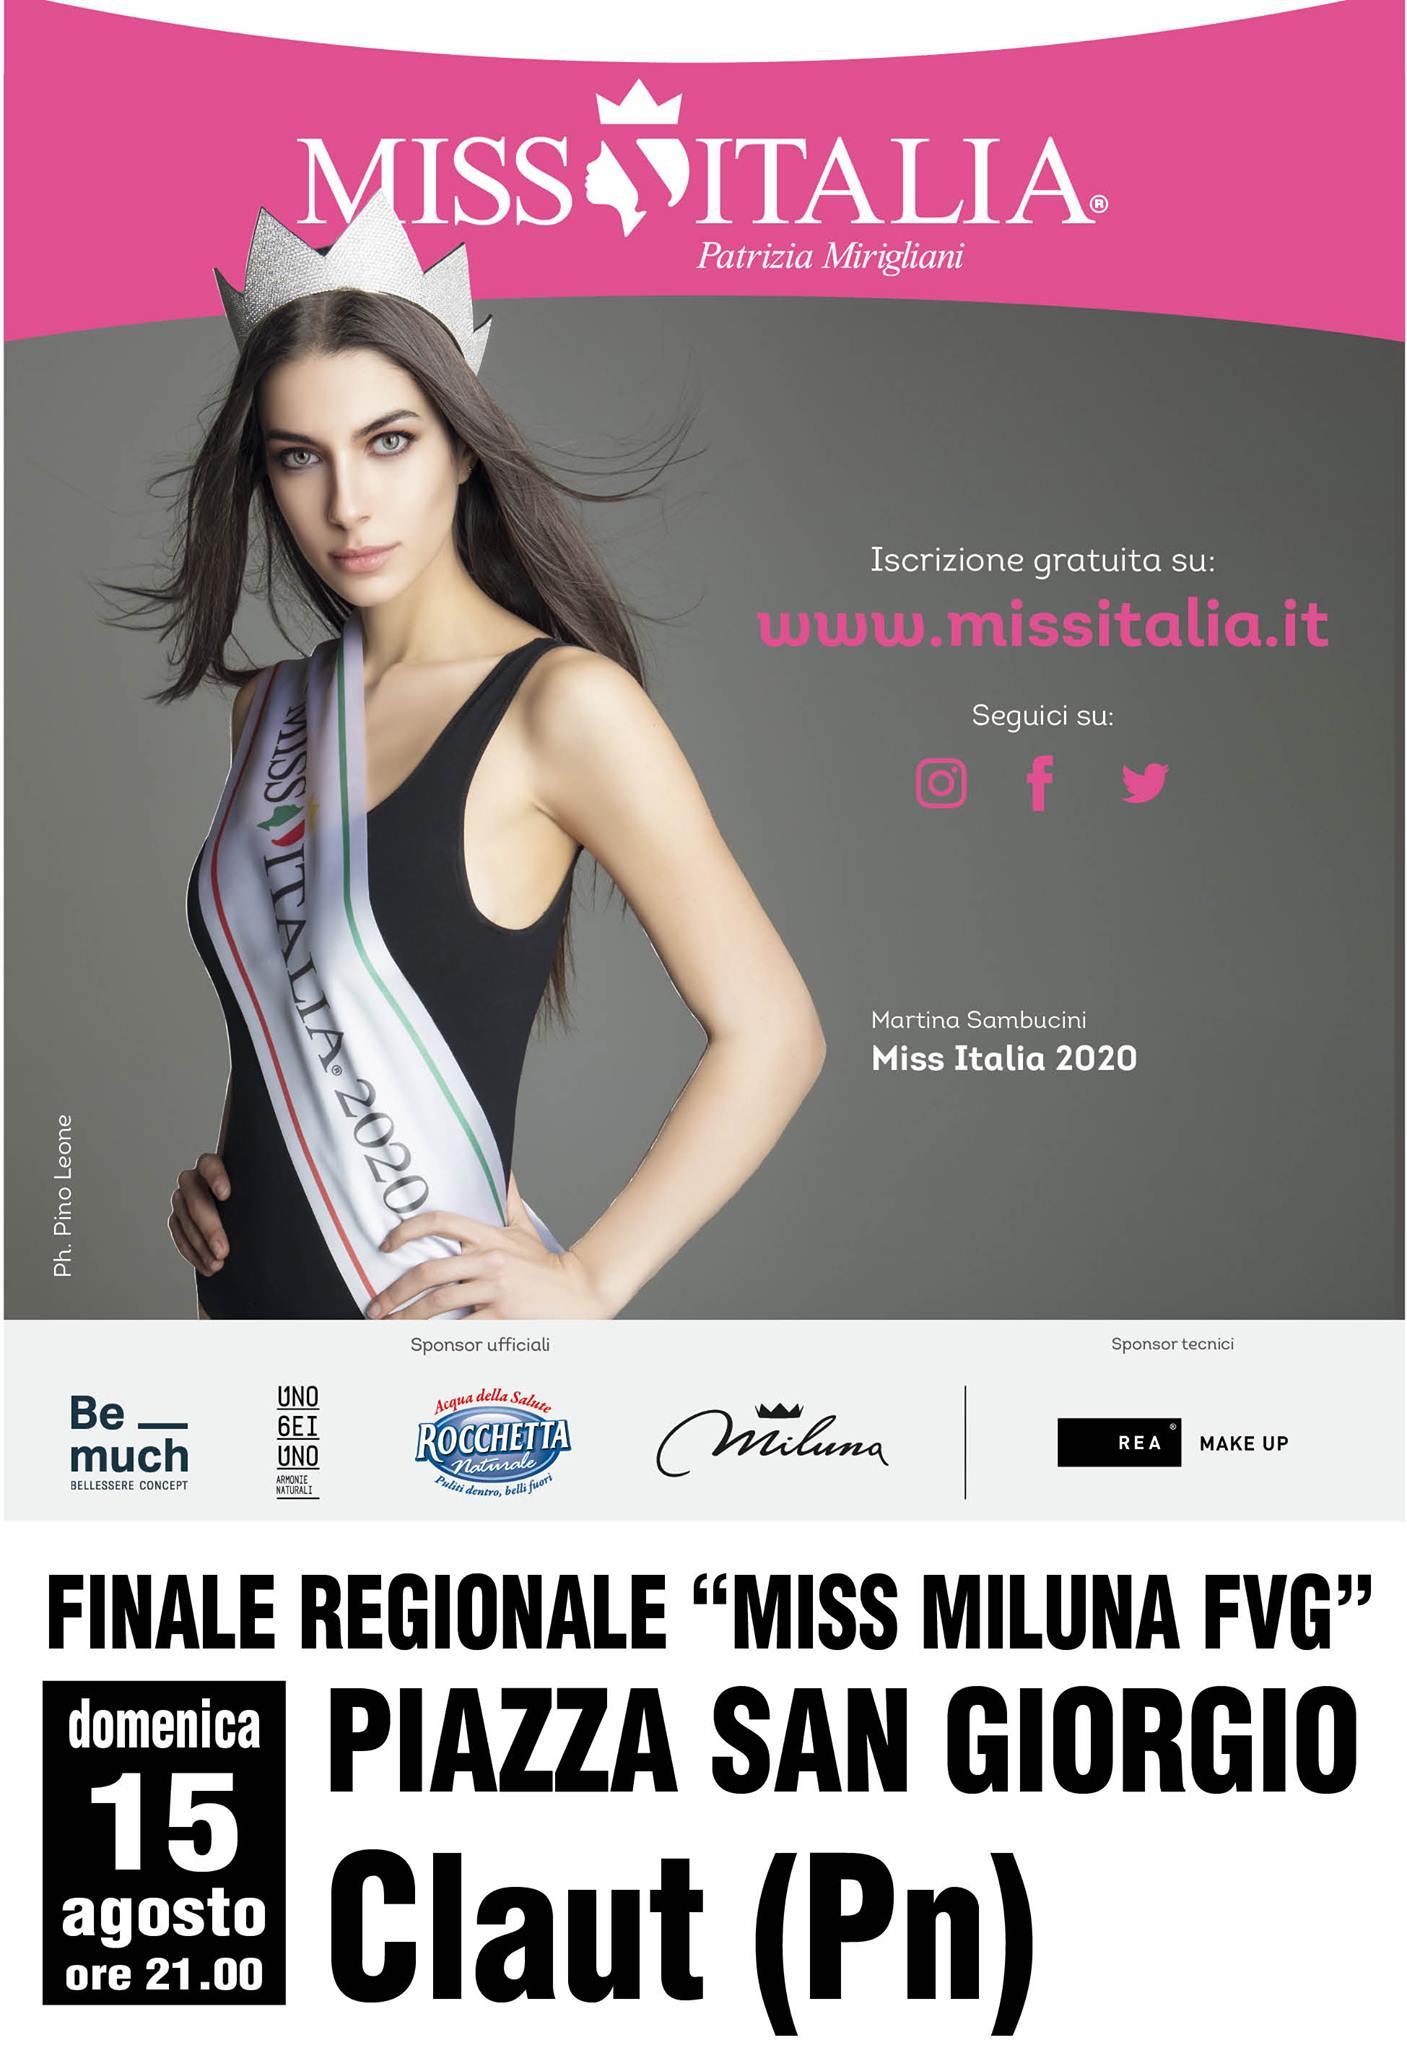 FINALE - MISS MILUNA FVG